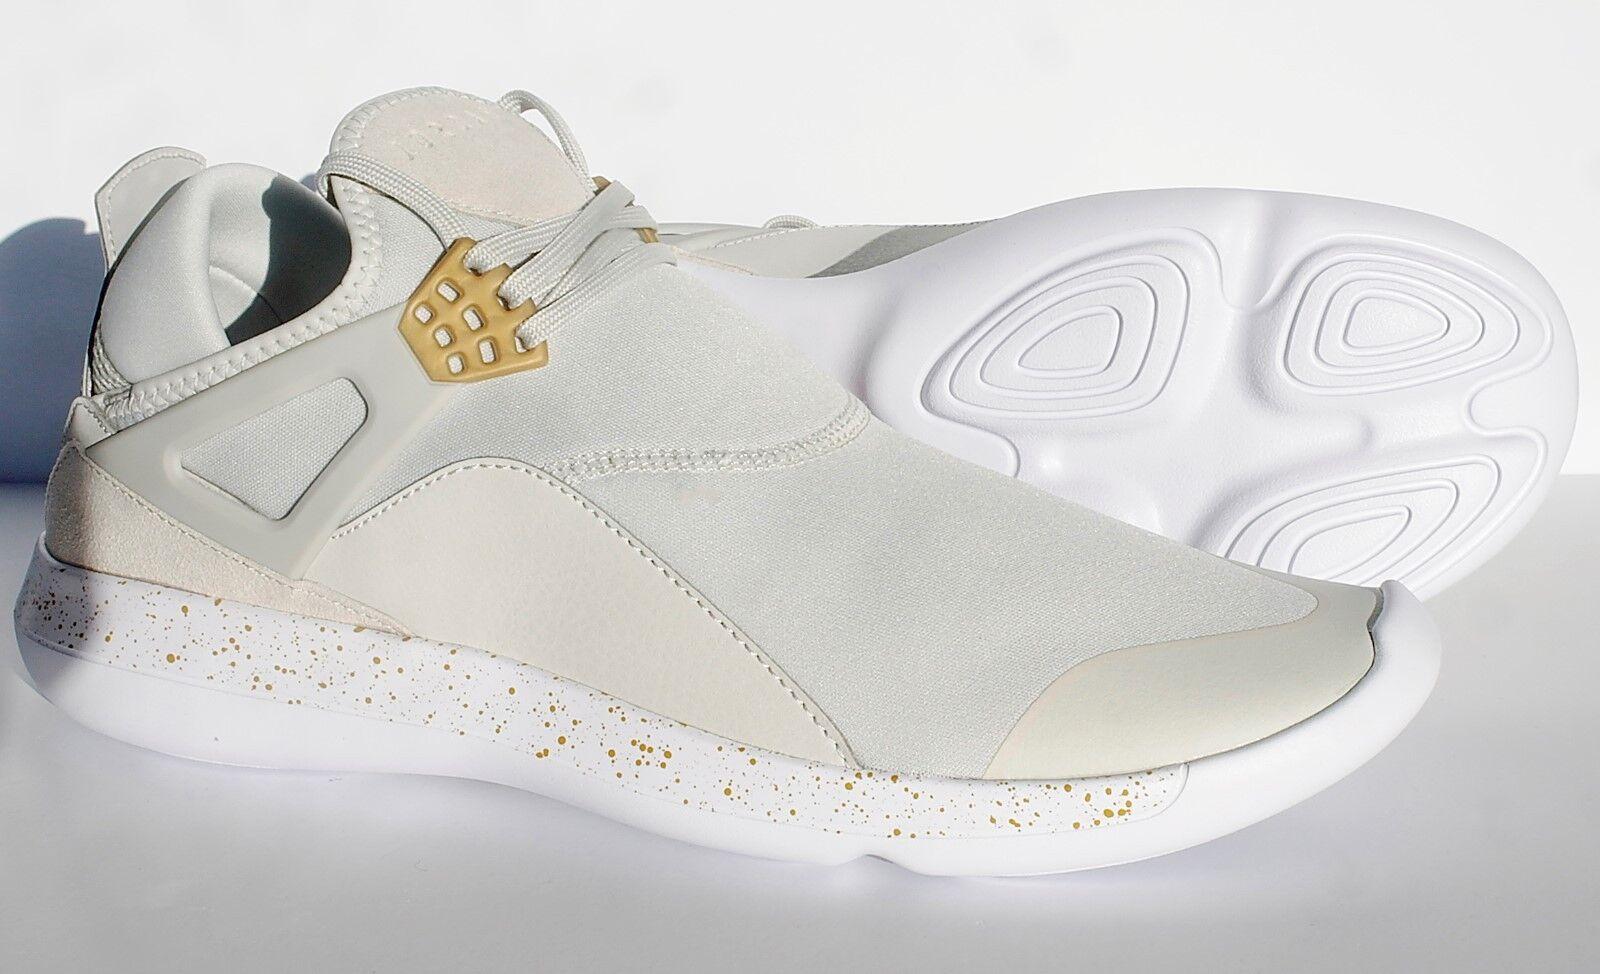 Nike Jordan Fly 89 Scarpe classiche da uomo